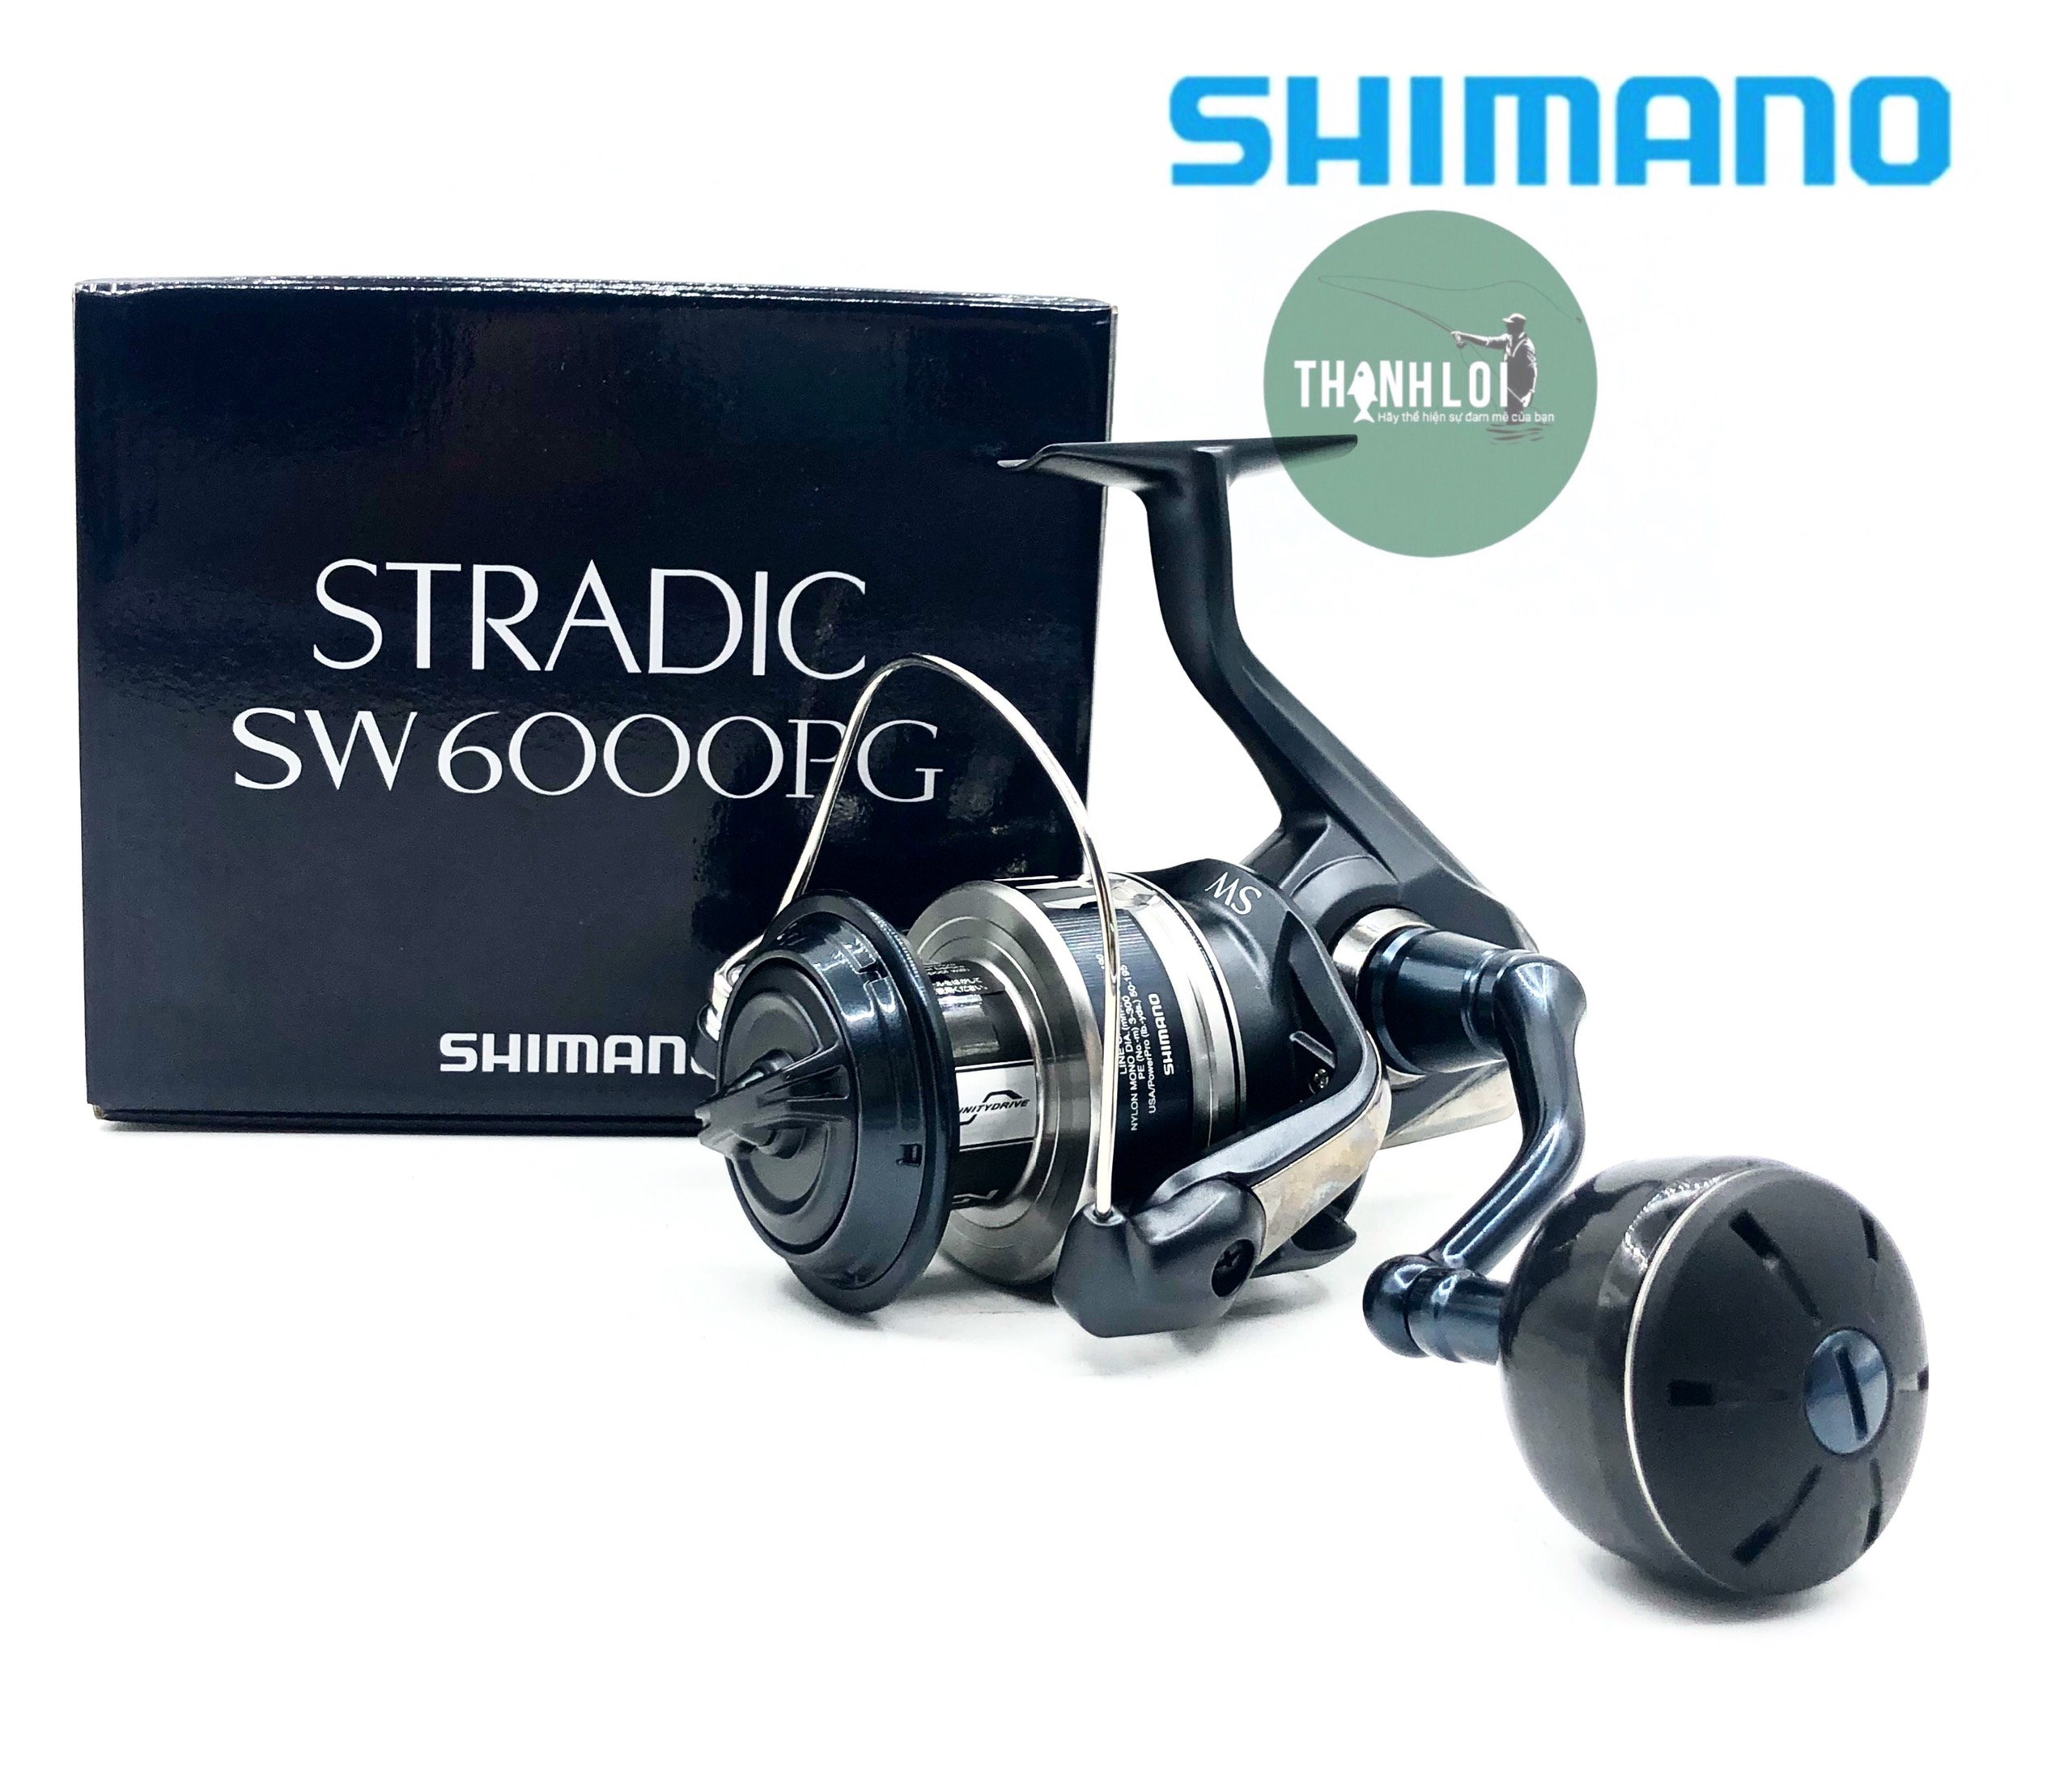 STRADIC SW 6000 - 8000